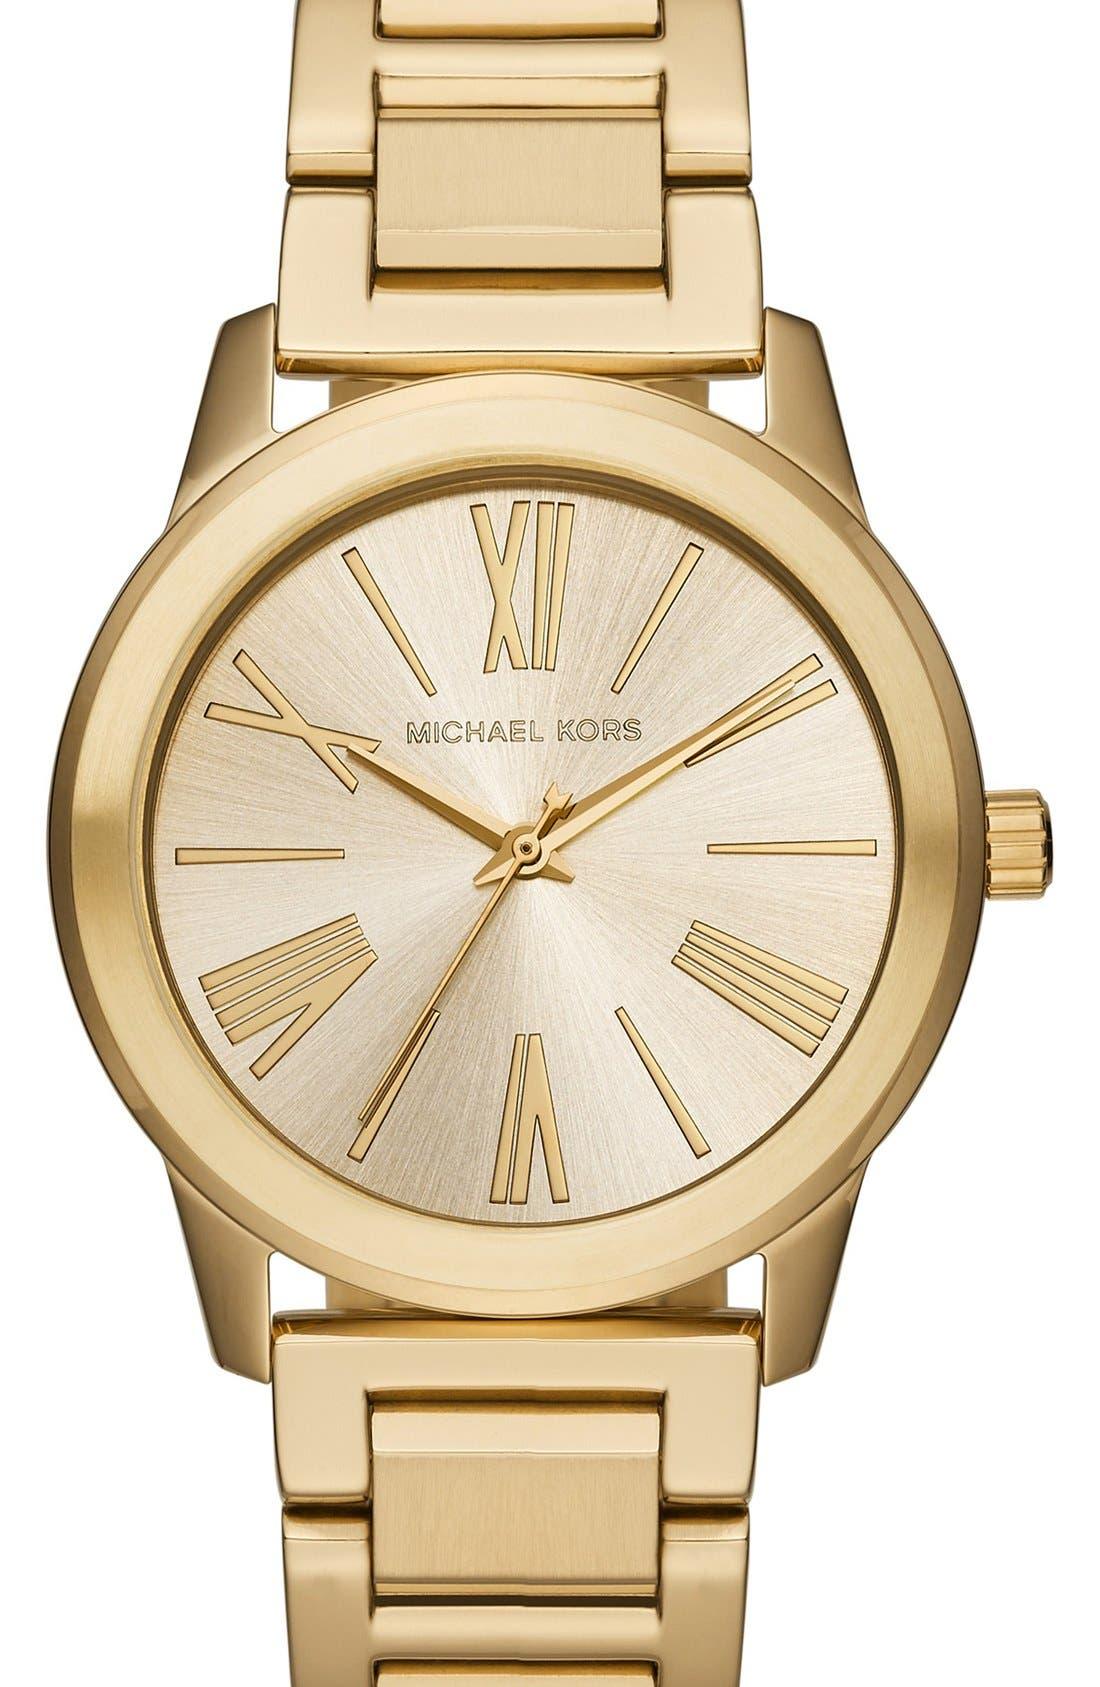 Main Image - Michael Kors 'Hartman' Bracelet Watch, 38mm